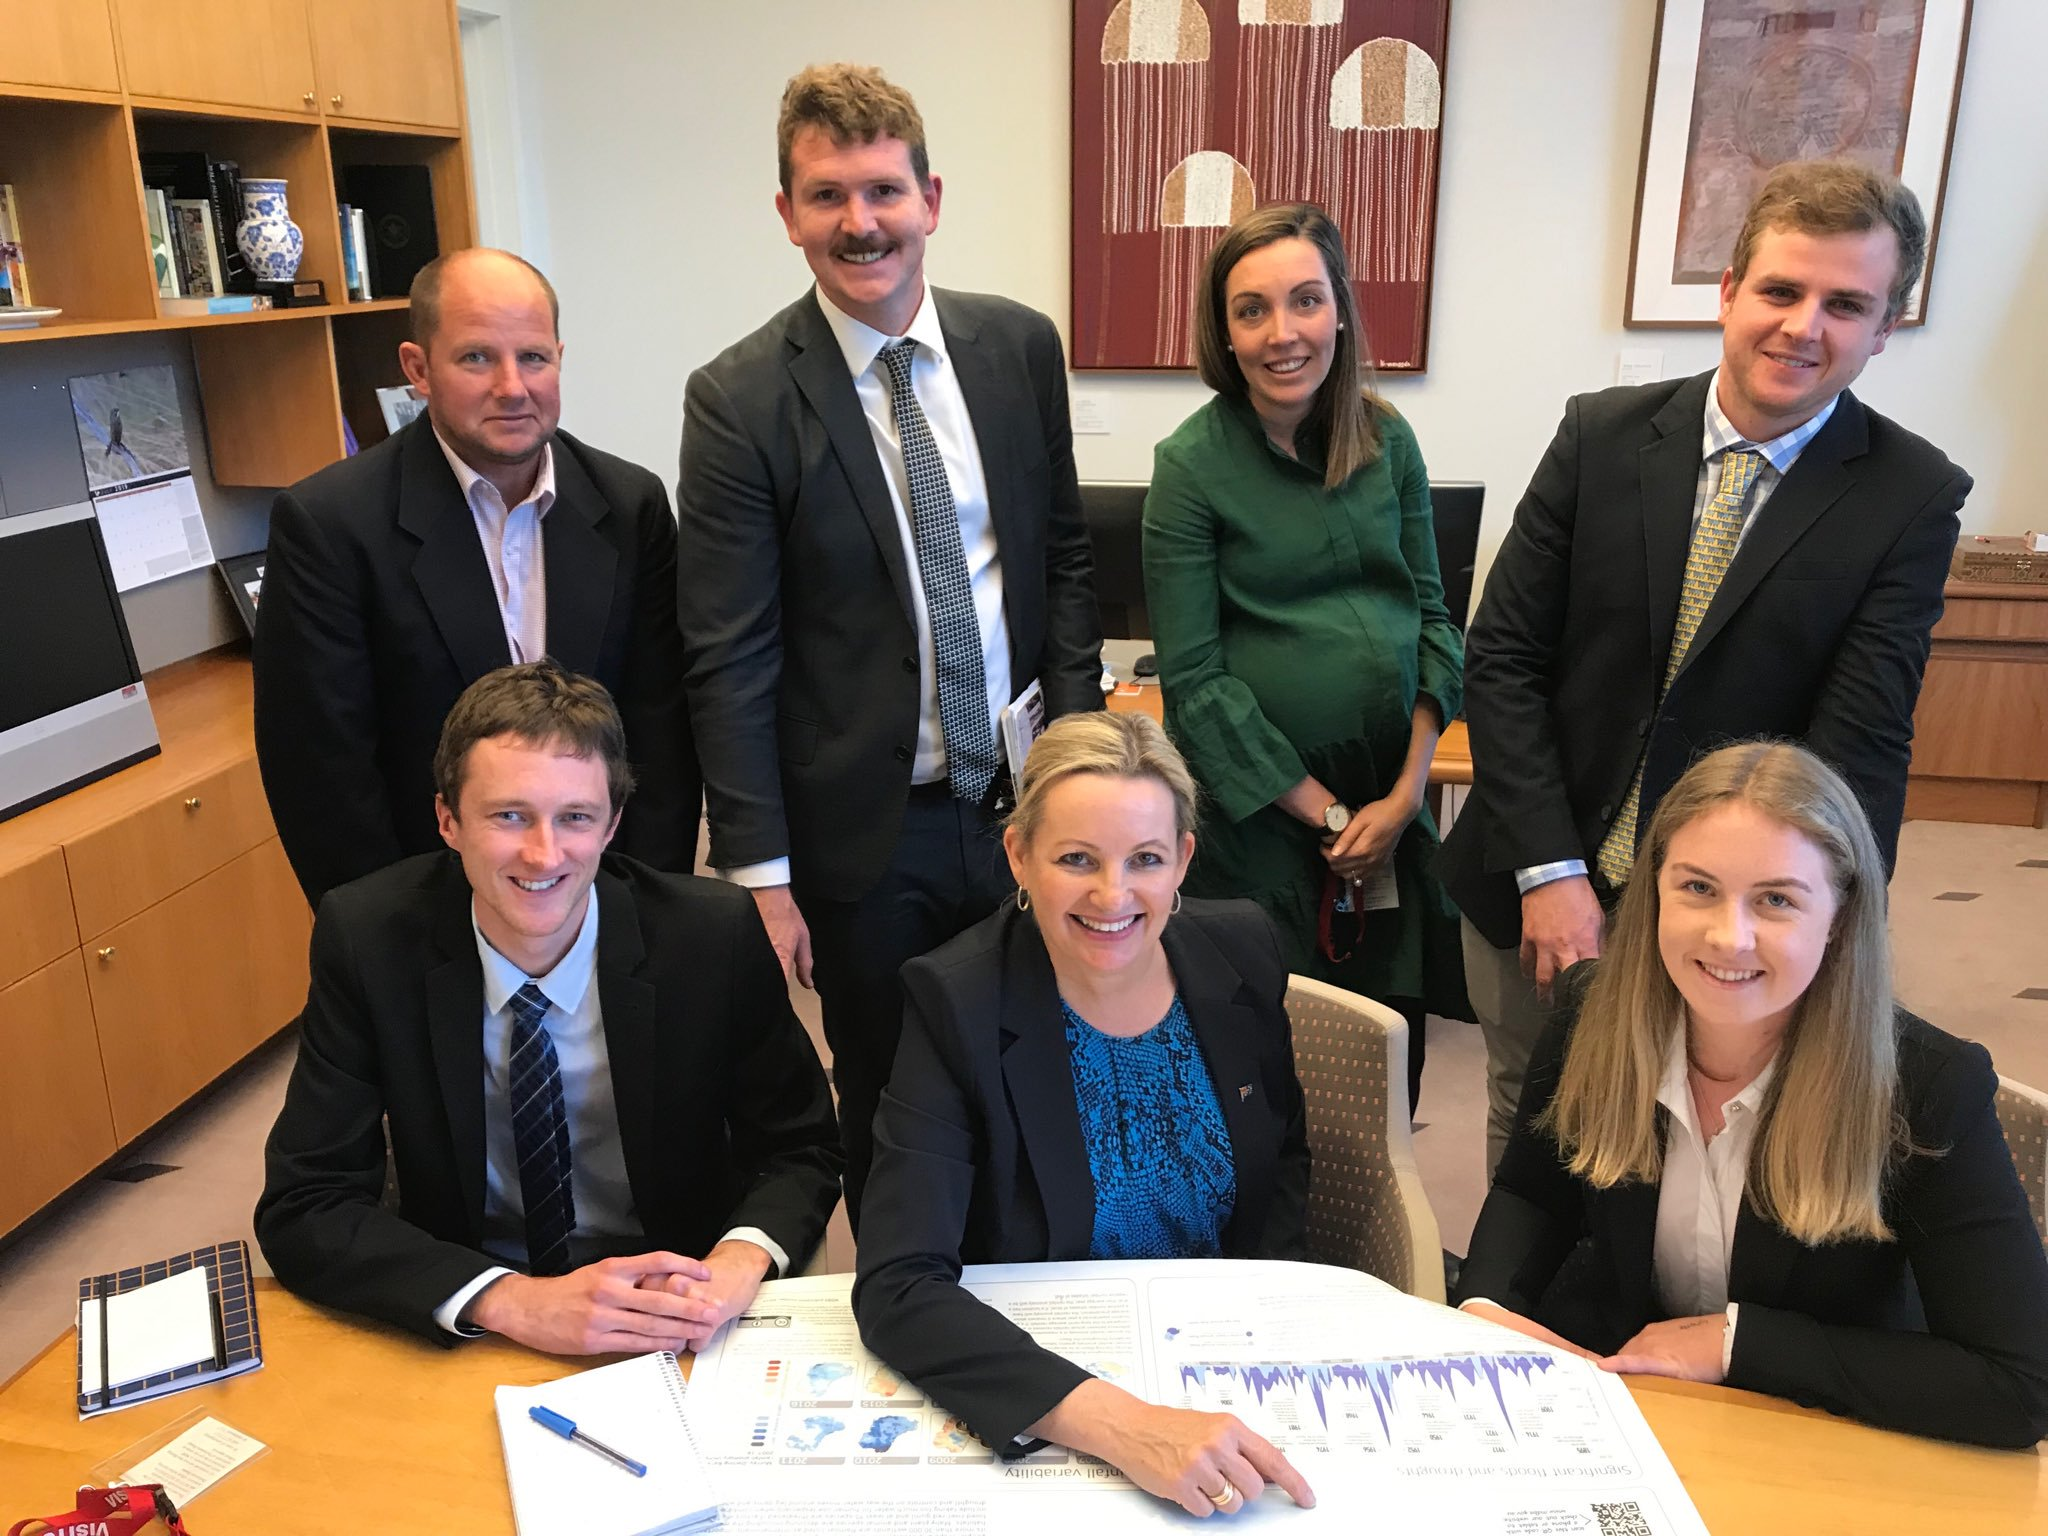 Troy Mauger (Rice Extension Coordinator) Tom Doyle, Rachel Kelly (RGA Policy Manager) Sam Sleigh, Josh Hart, Minister Susan Ley, Samantha Glenn